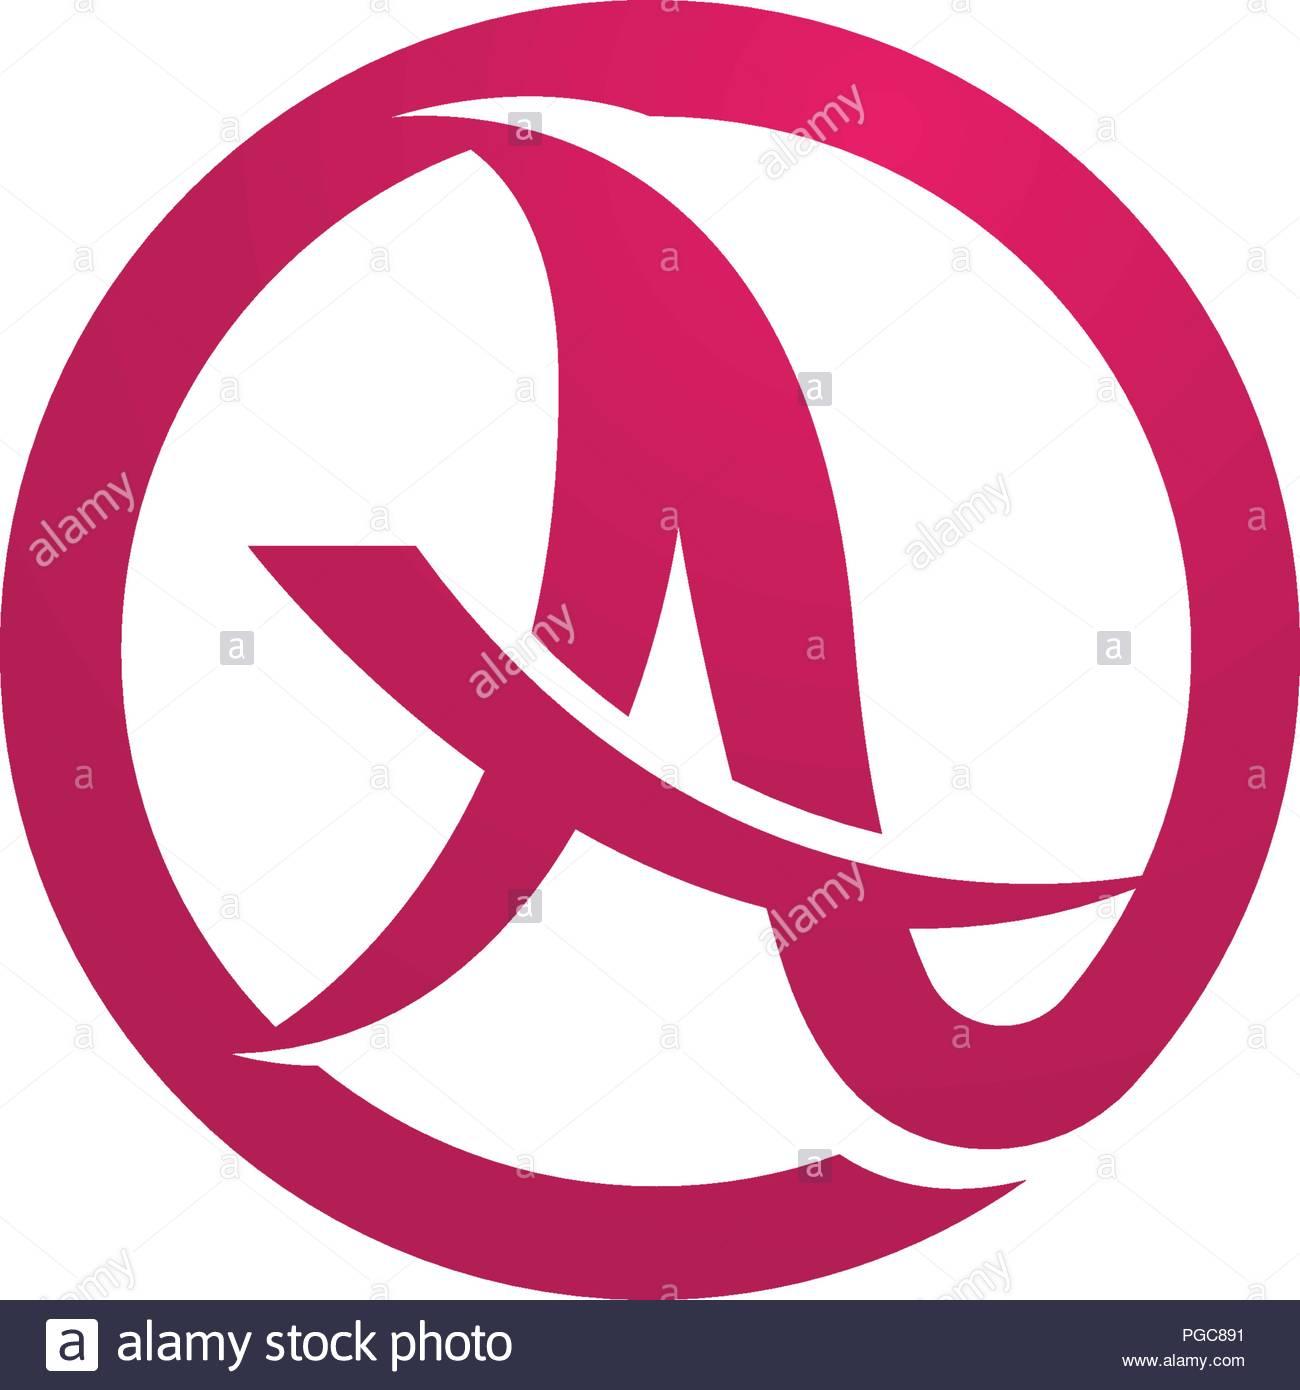 Letter Logo Stock Photos & Letter Logo Stock Images - Alamy